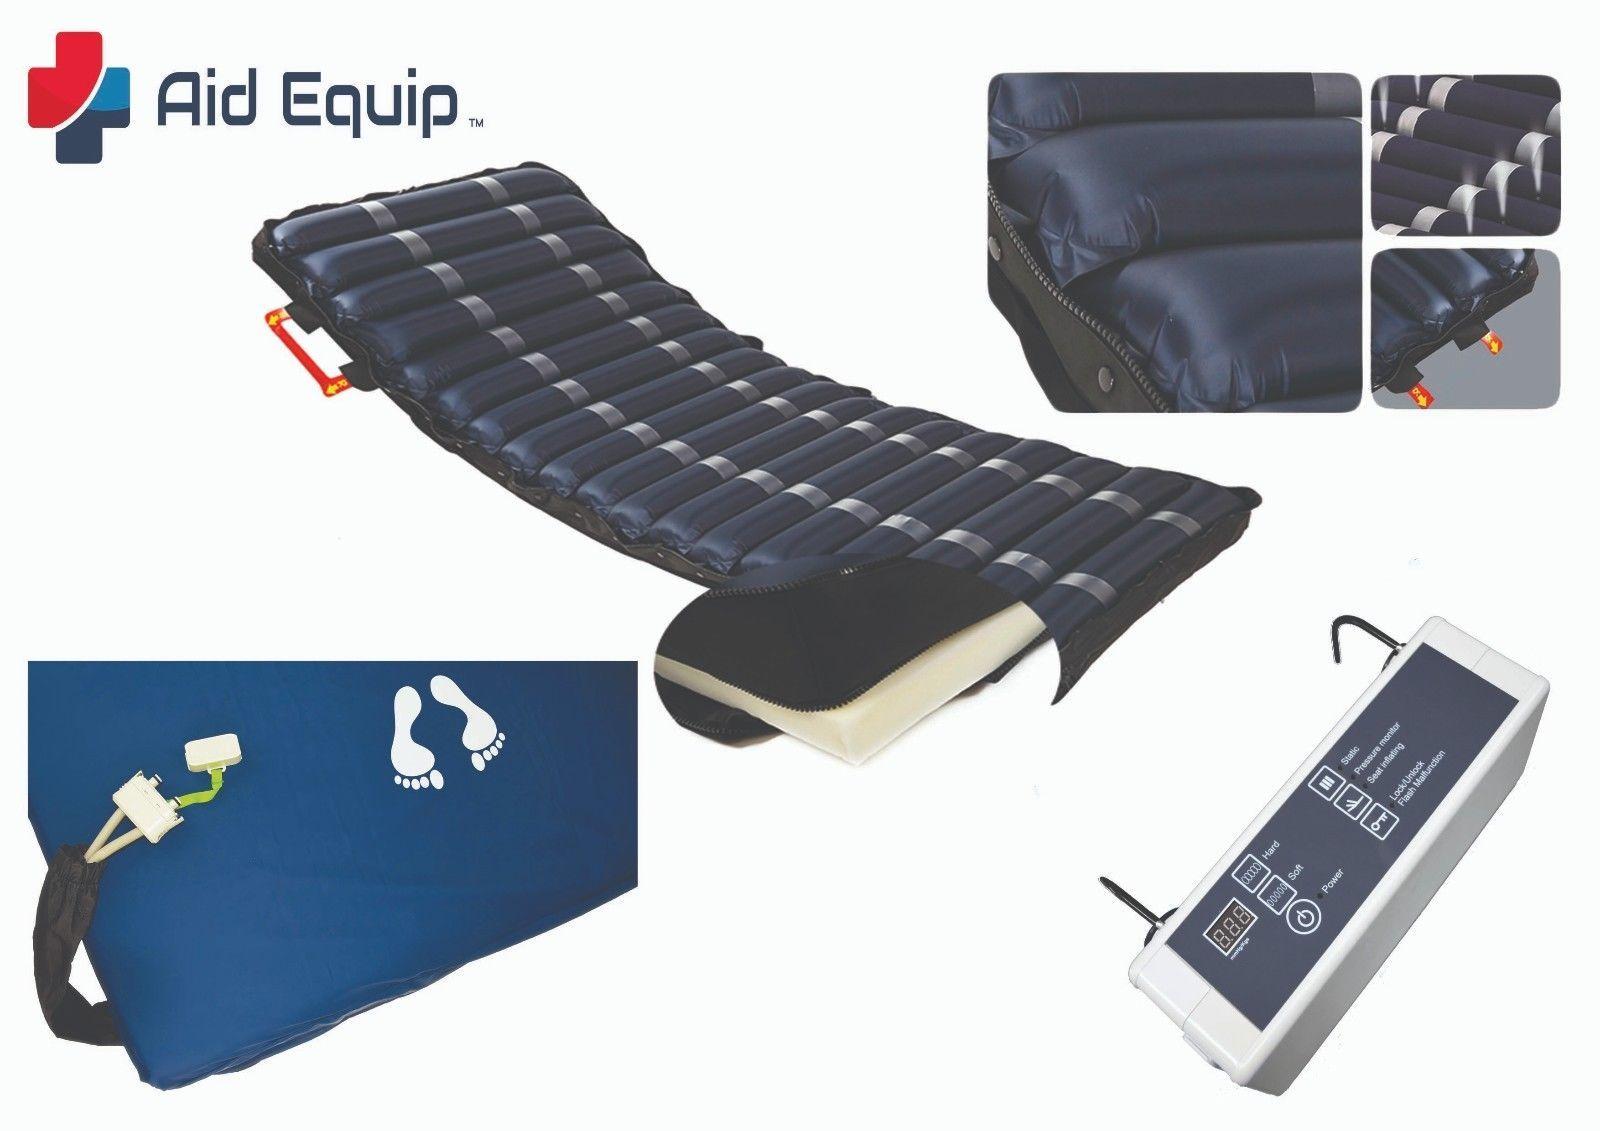 Hospital bed Alternating air mattress 2 in 1 system (High